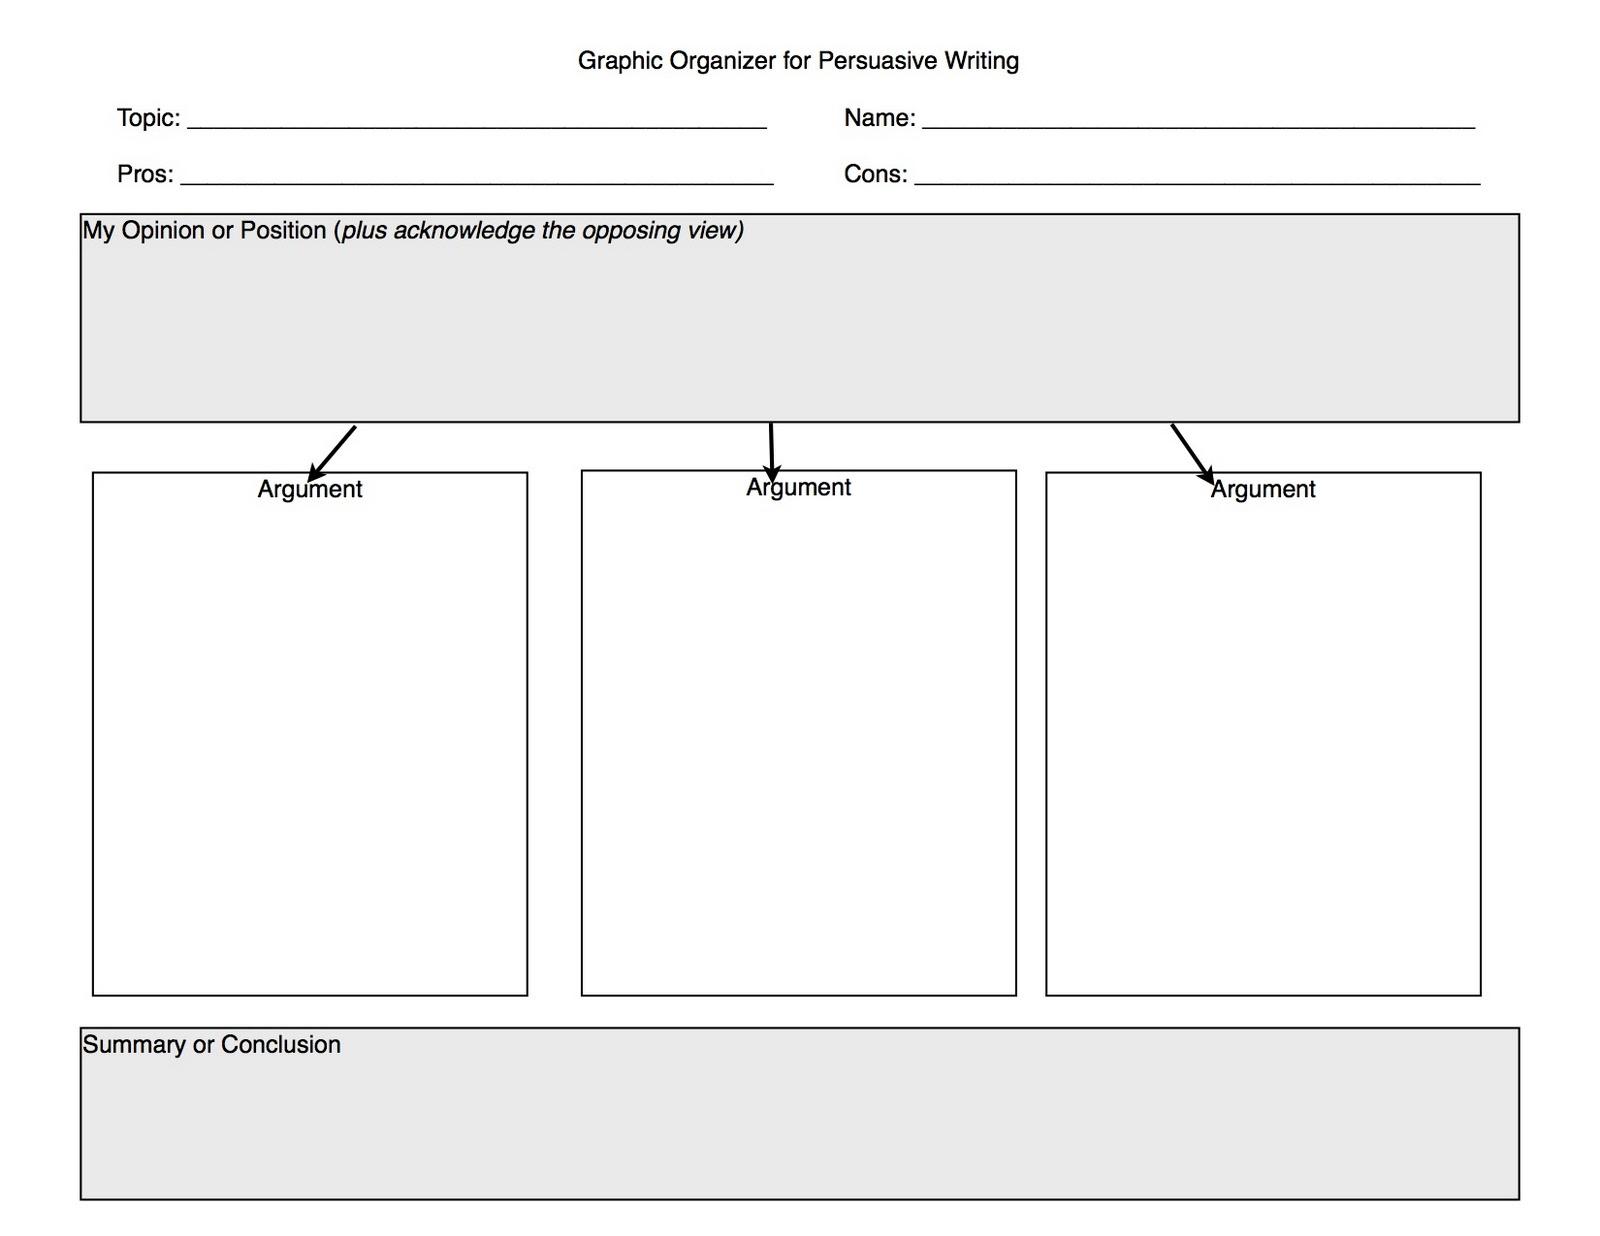 Argumentative essay topics for cxc picture 4